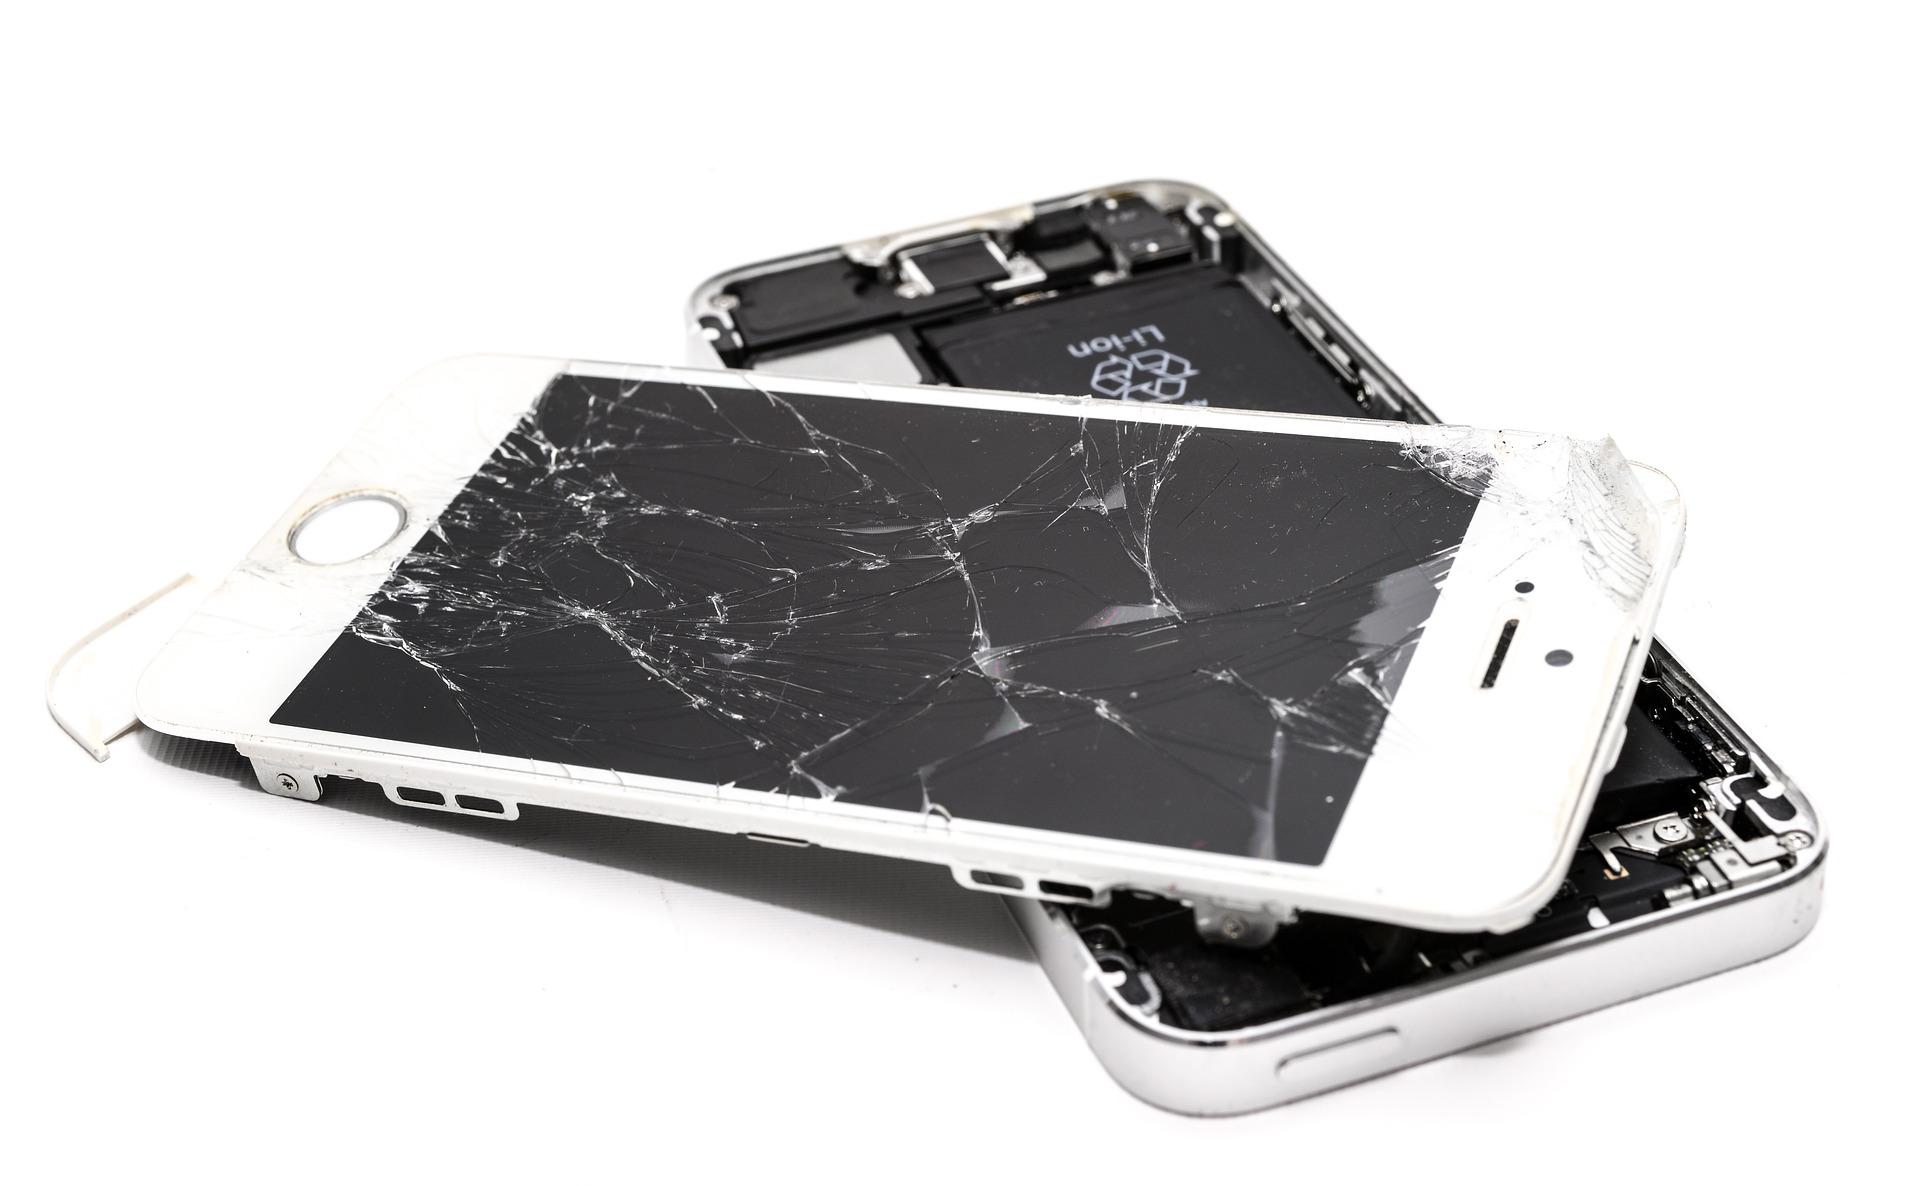 Riparazione cellulari smartphone iphone